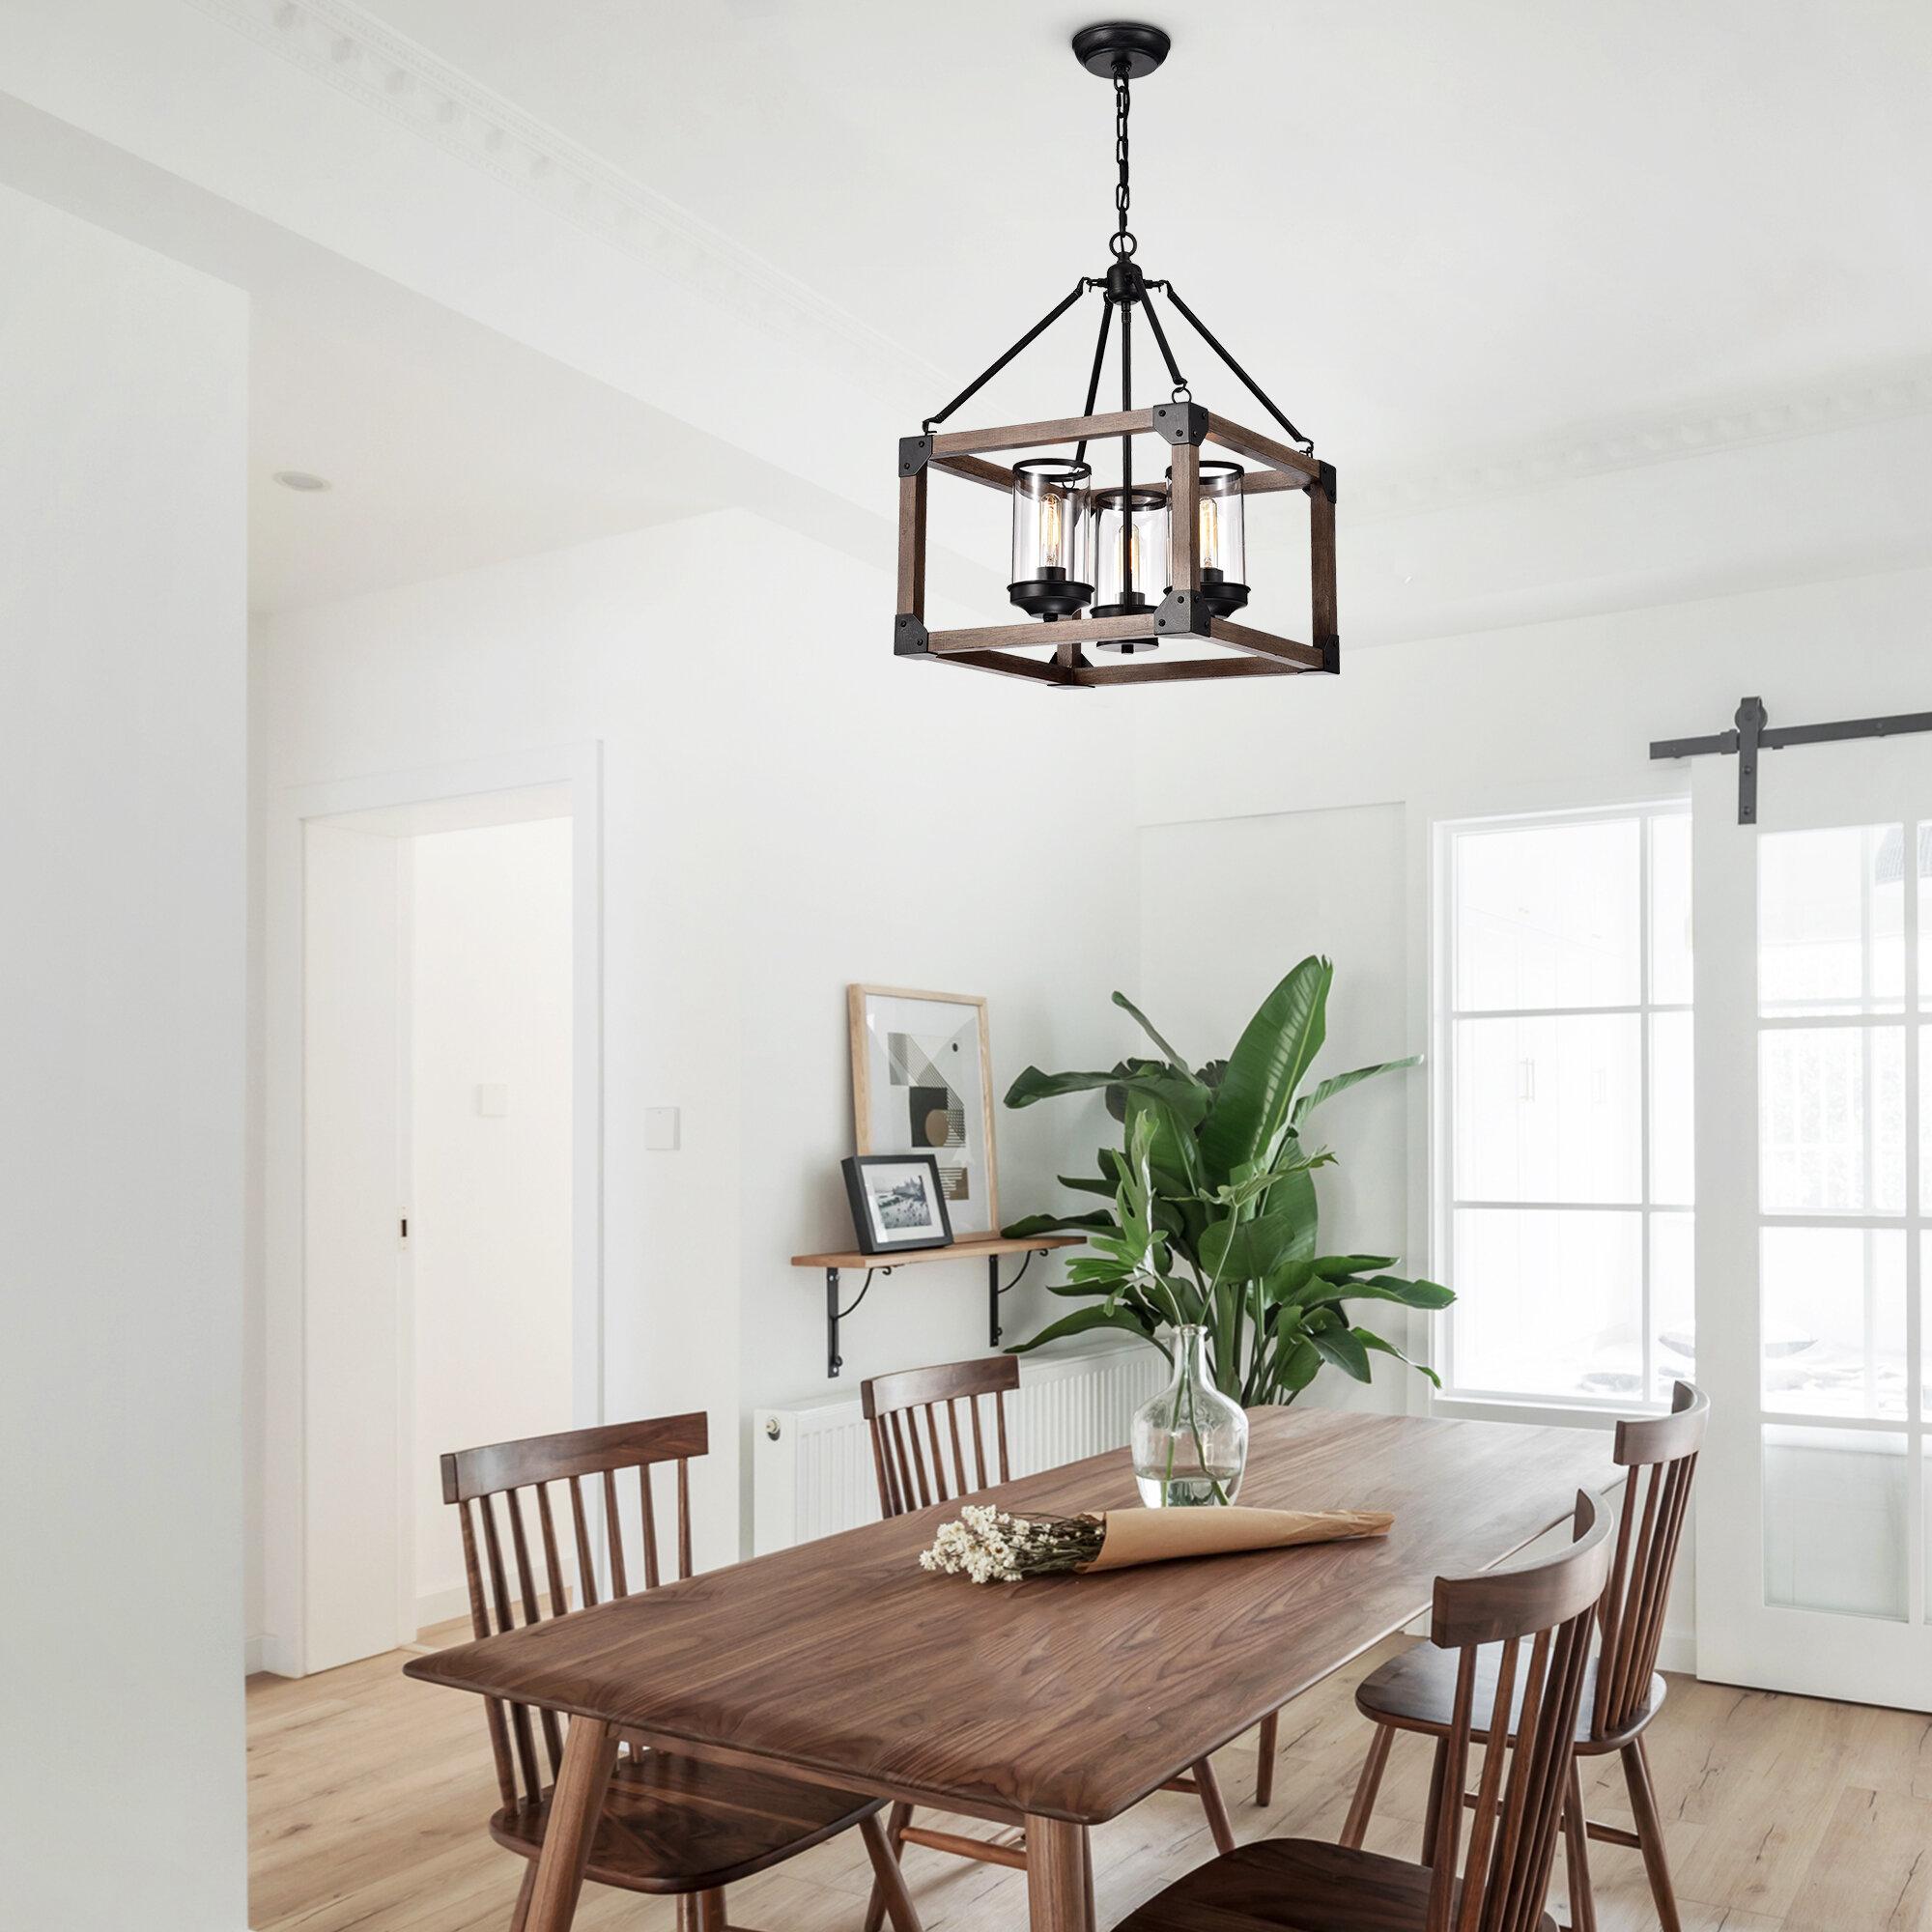 Gracie Oaks Trawick 3 Light Lantern Square Chandelier Reviews Wayfair